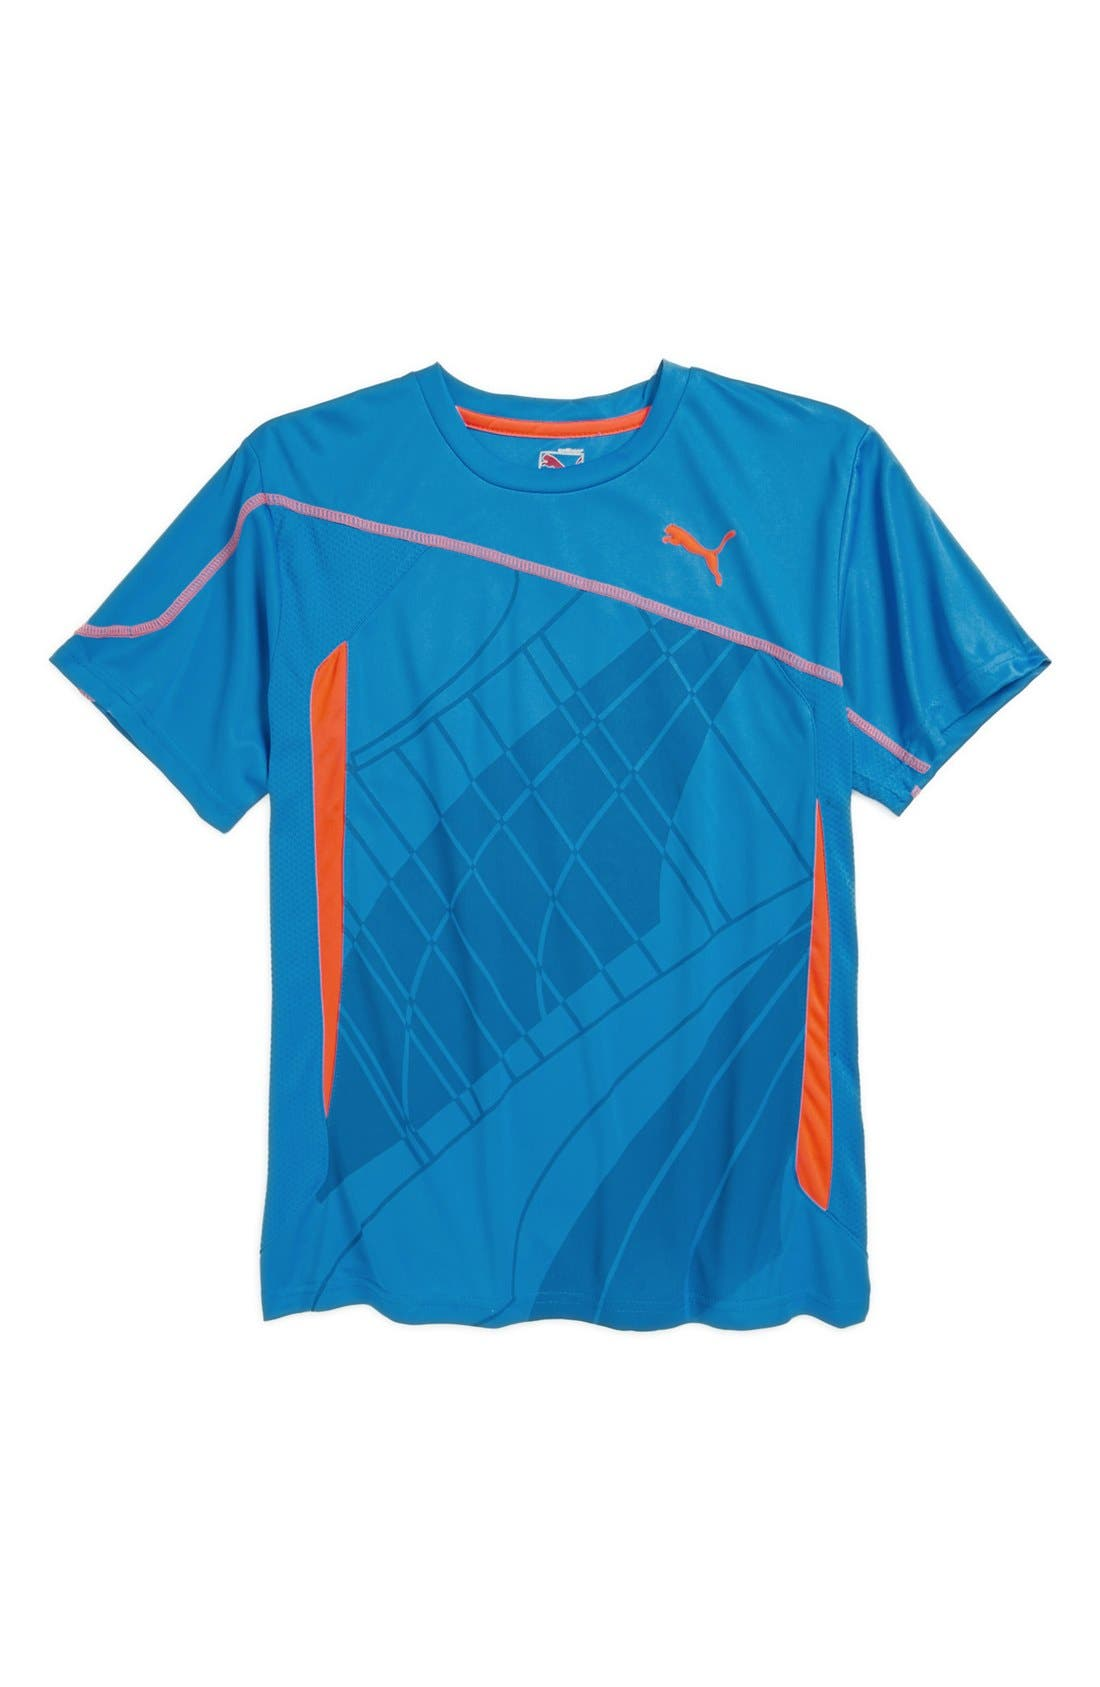 Alternate Image 1 Selected - PUMA 'Formstripe' T-Shirt (Big Boys)